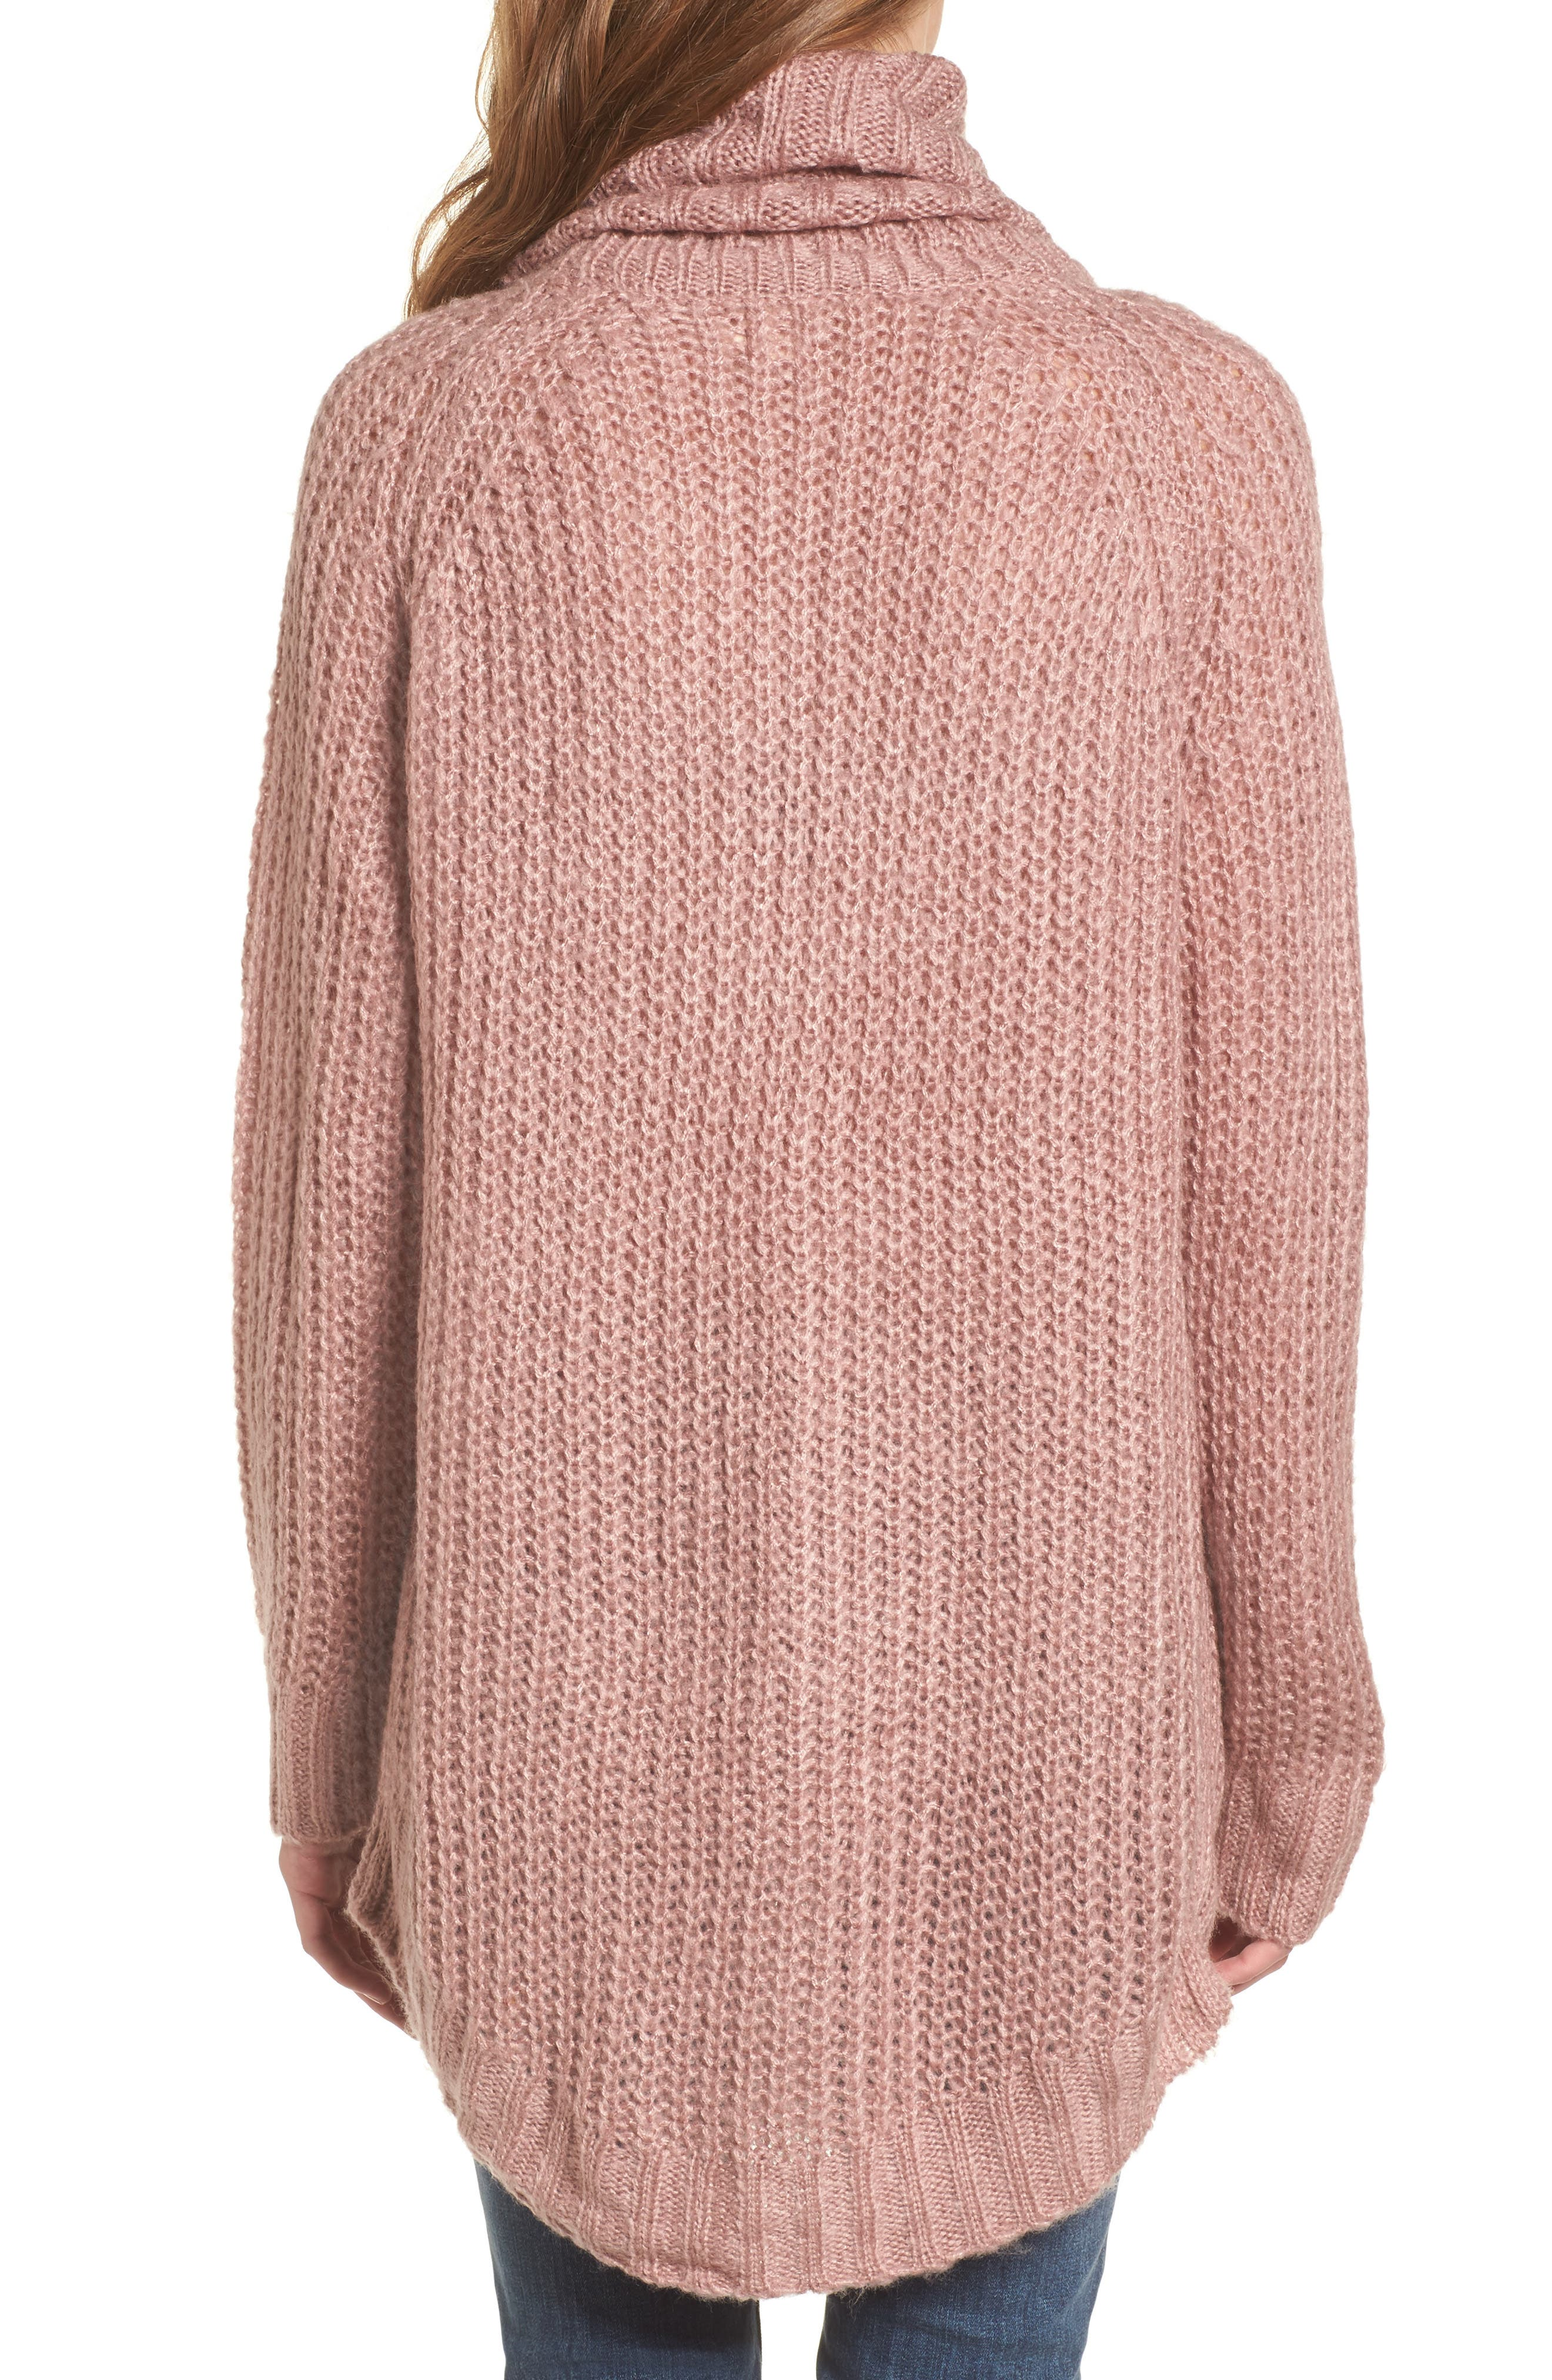 Cowl Neck Sweater,                             Alternate thumbnail 2, color,                             680